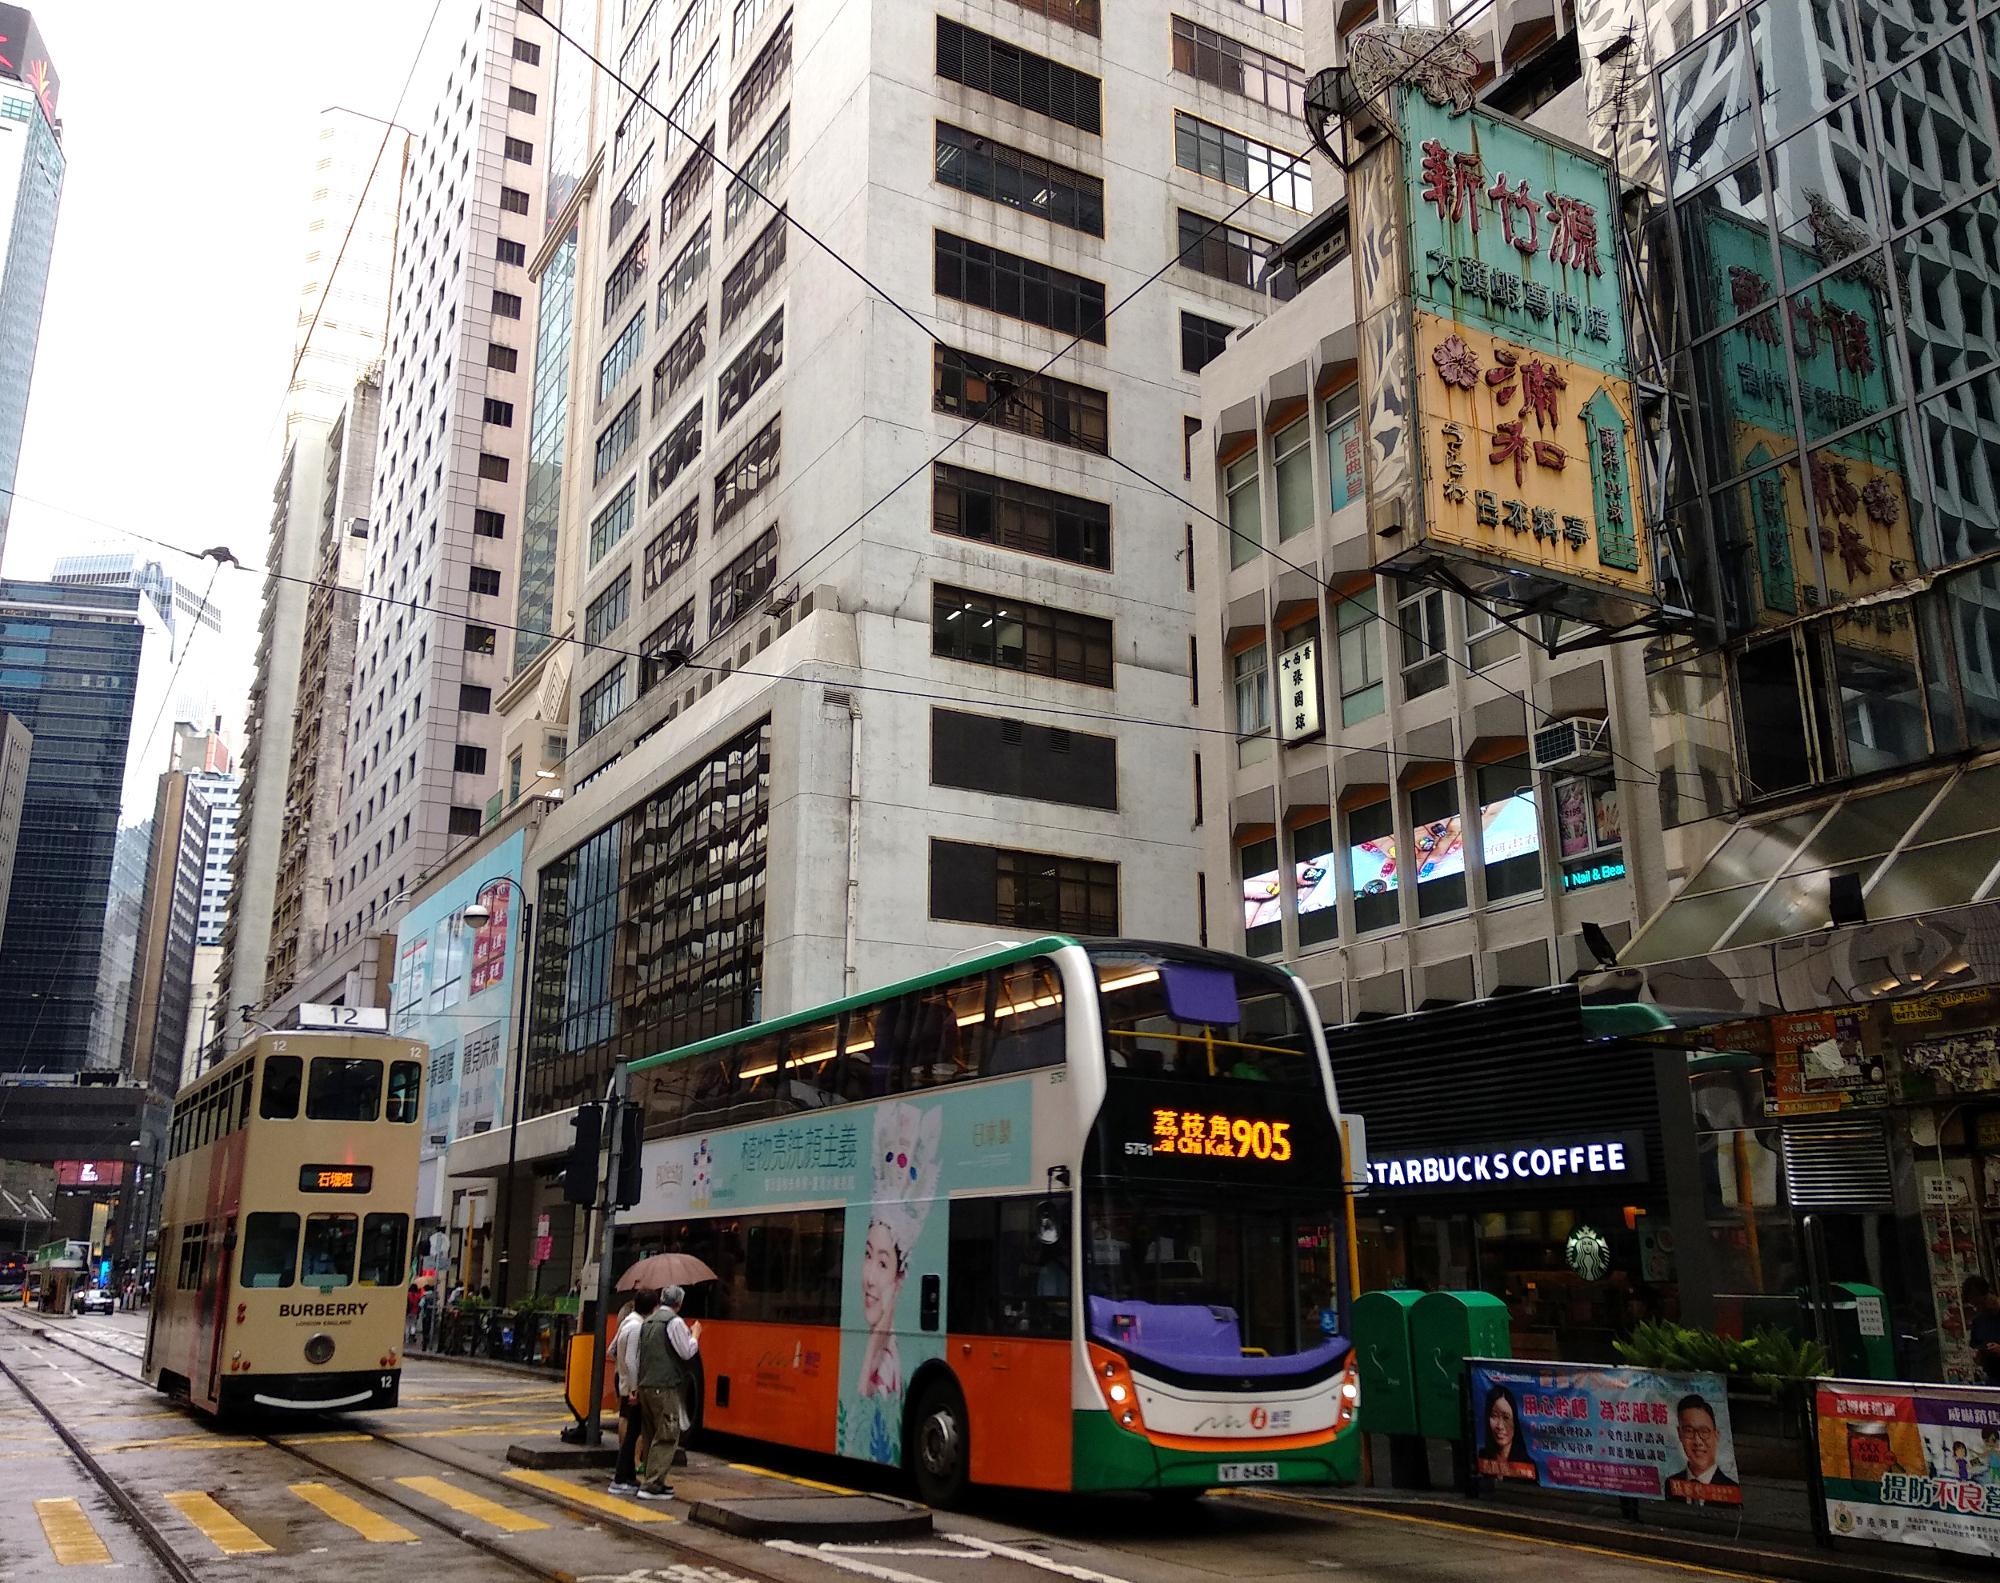 Tram and Bus in Sheung Wan